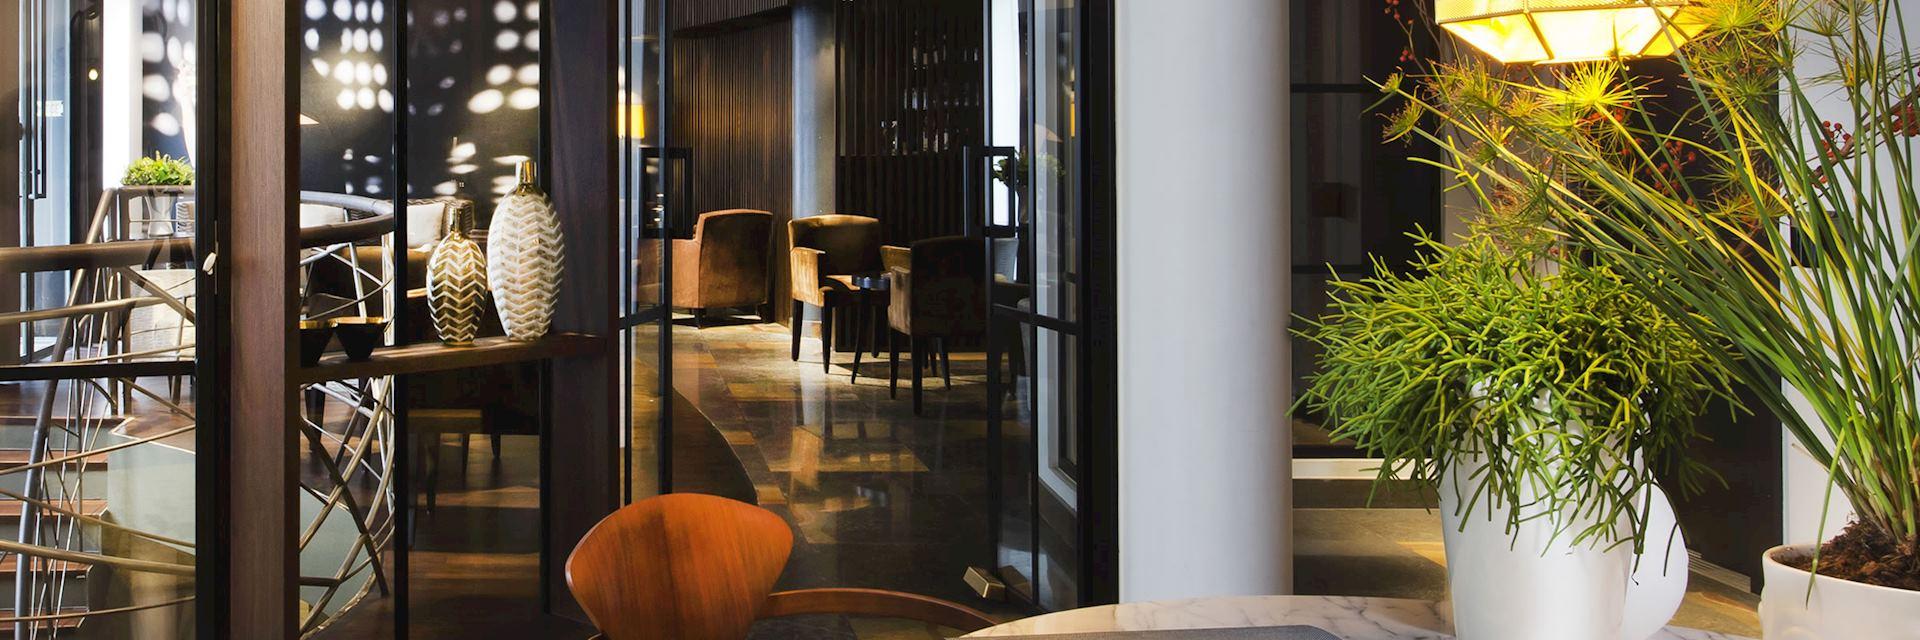 Hotel Villa Saint-Germain